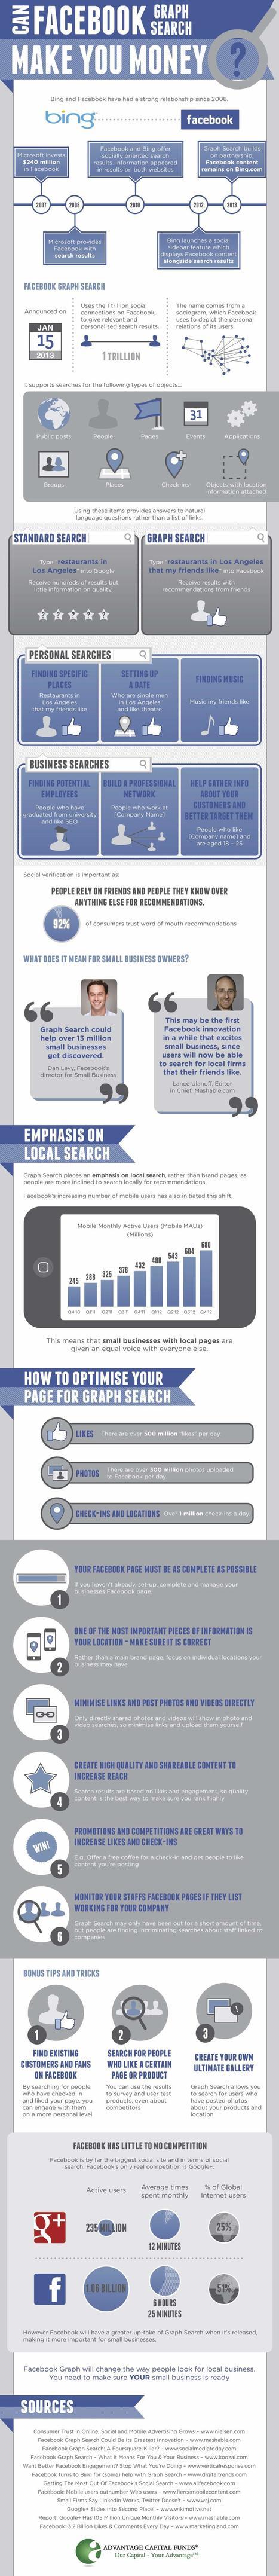 Infographic: Can Facebook Graph Make You Money? | sabkarsocialmediaInfographics | Scoop.it